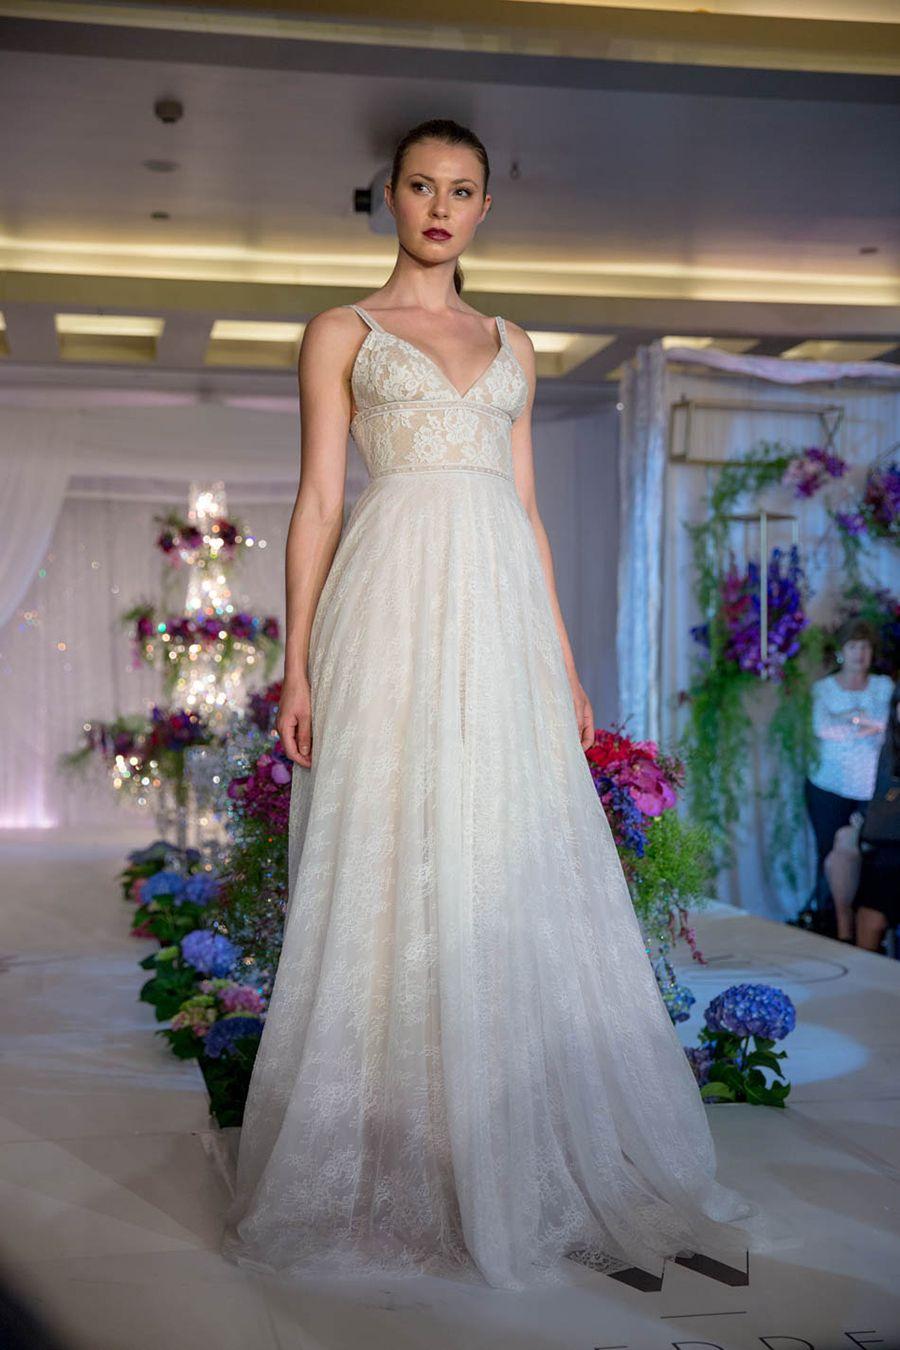 Fiber optic wedding dress  Stepping Into a Wedding Wonderland The Bridal Bazaar  Part